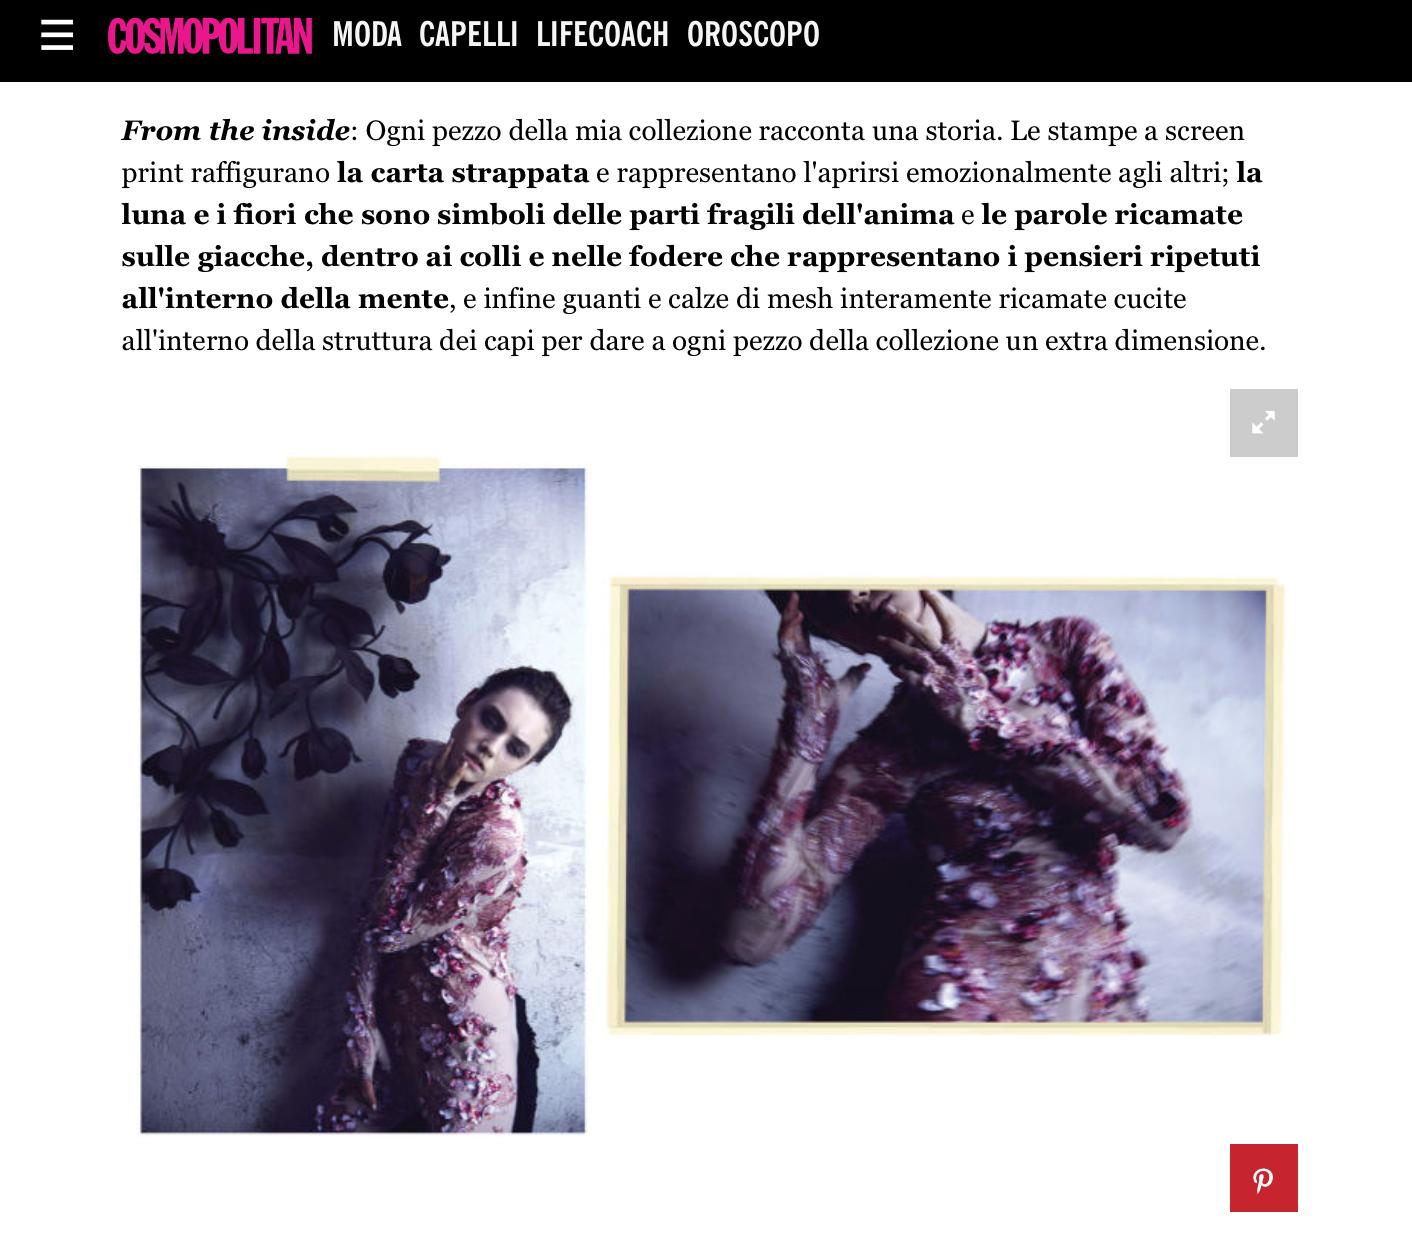 http://Cosmopolitan